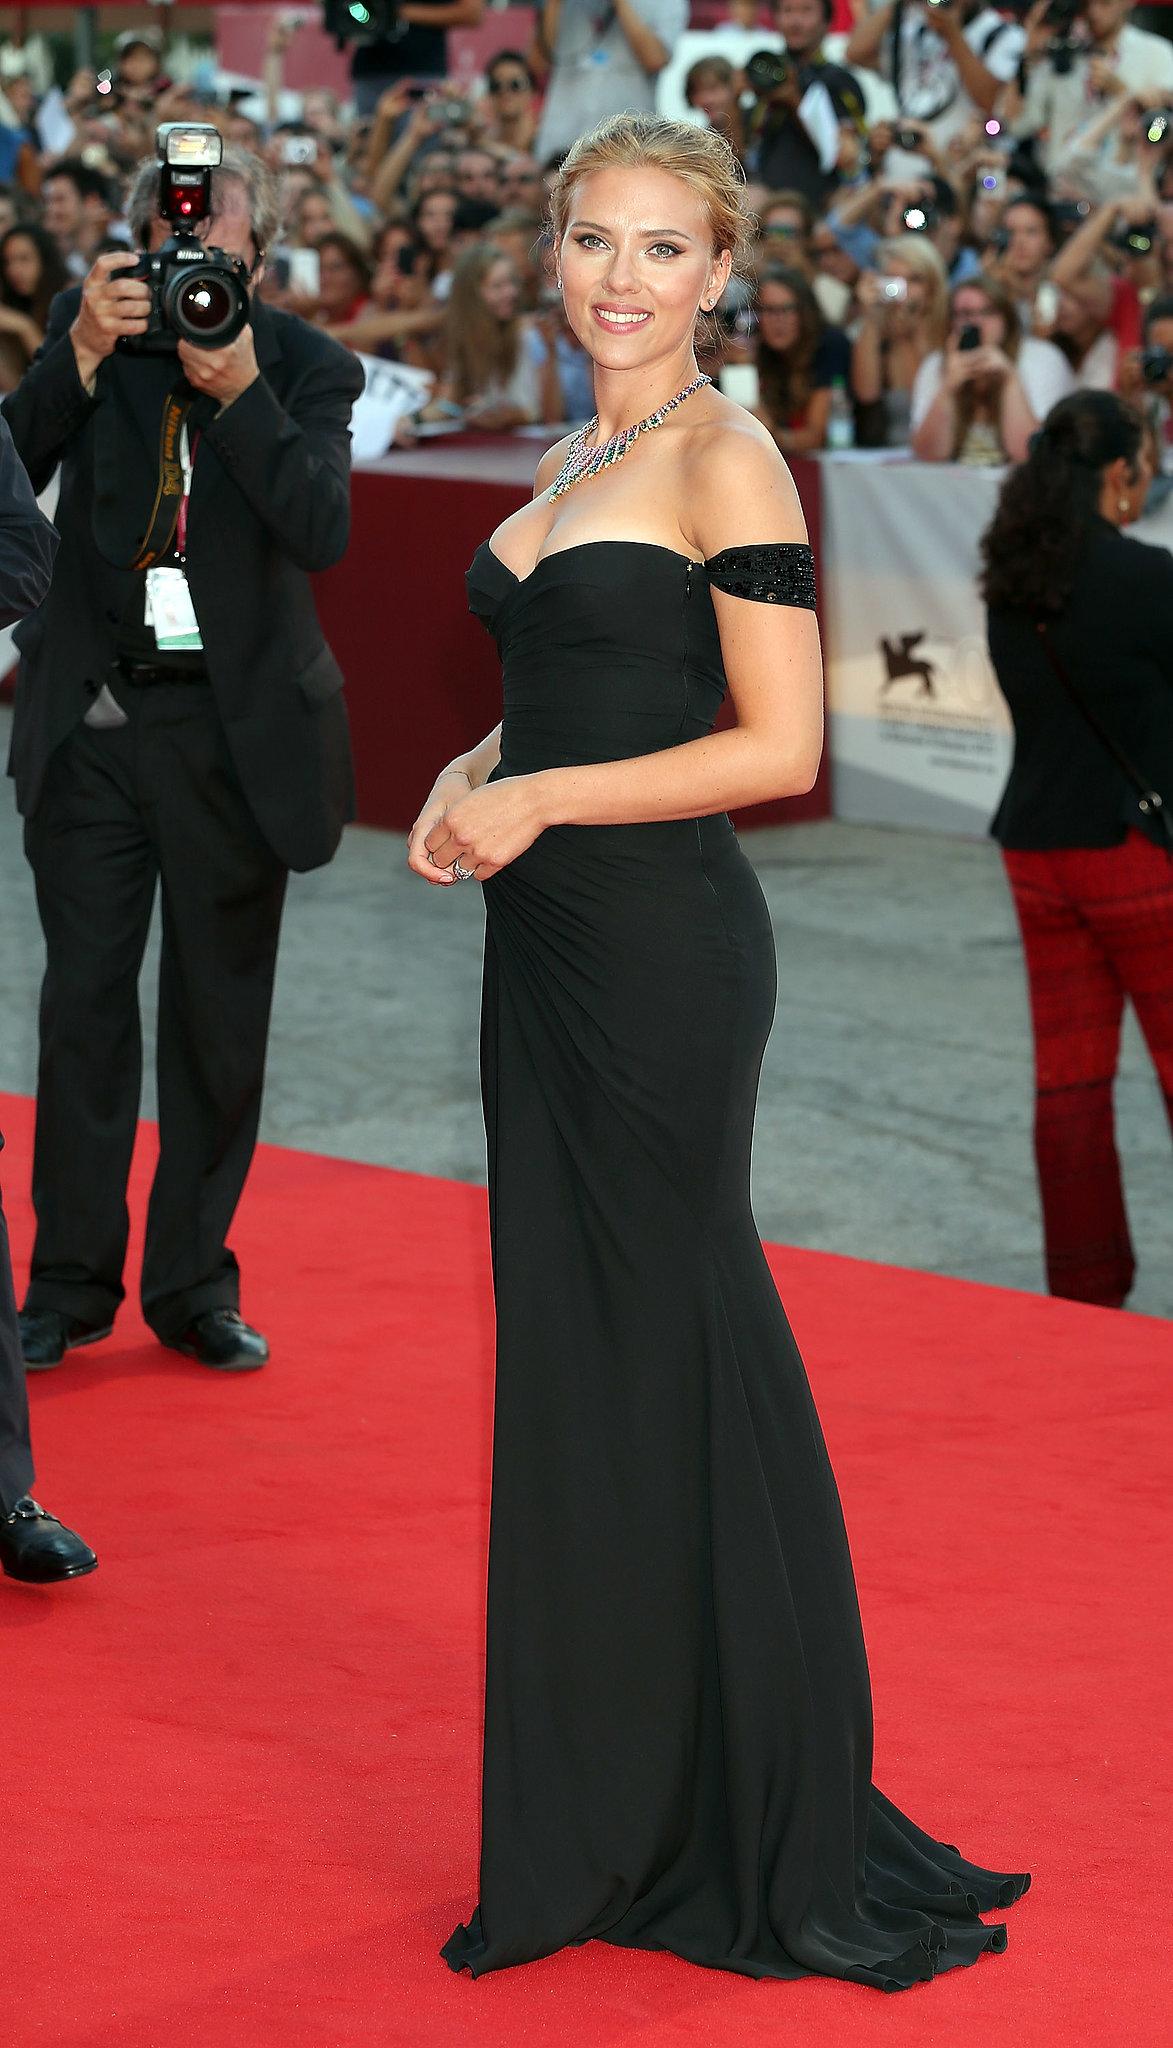 Scarlett Johansson attended the premiere of Under the Skin.